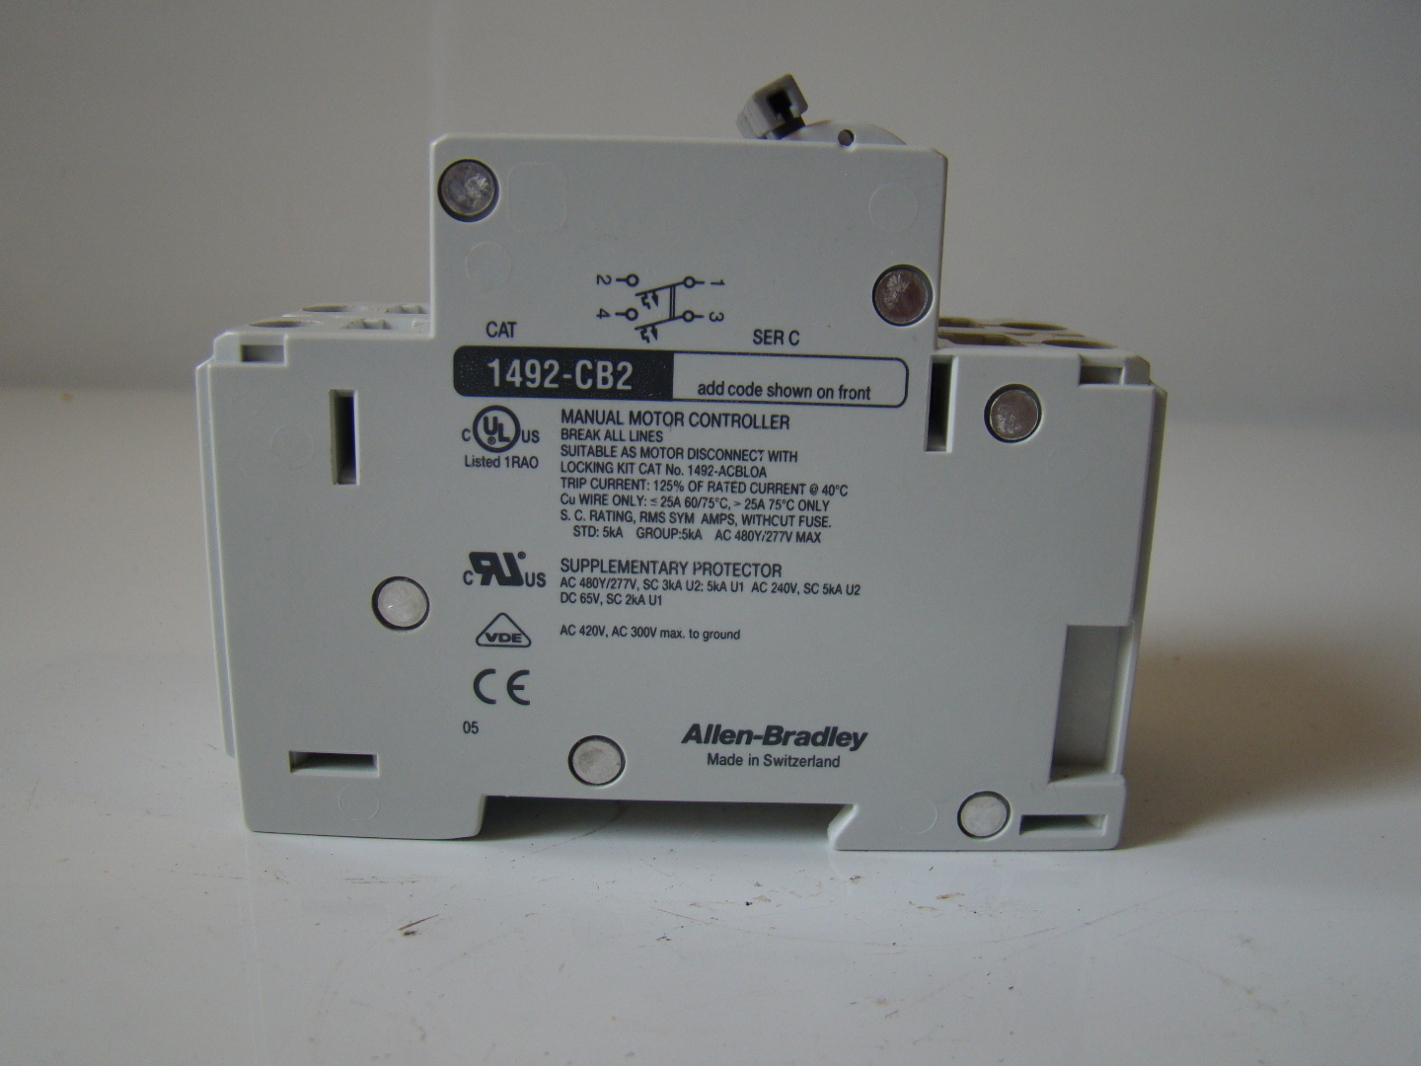 allen bradley manual motor control 1492 cb2g100 ebay